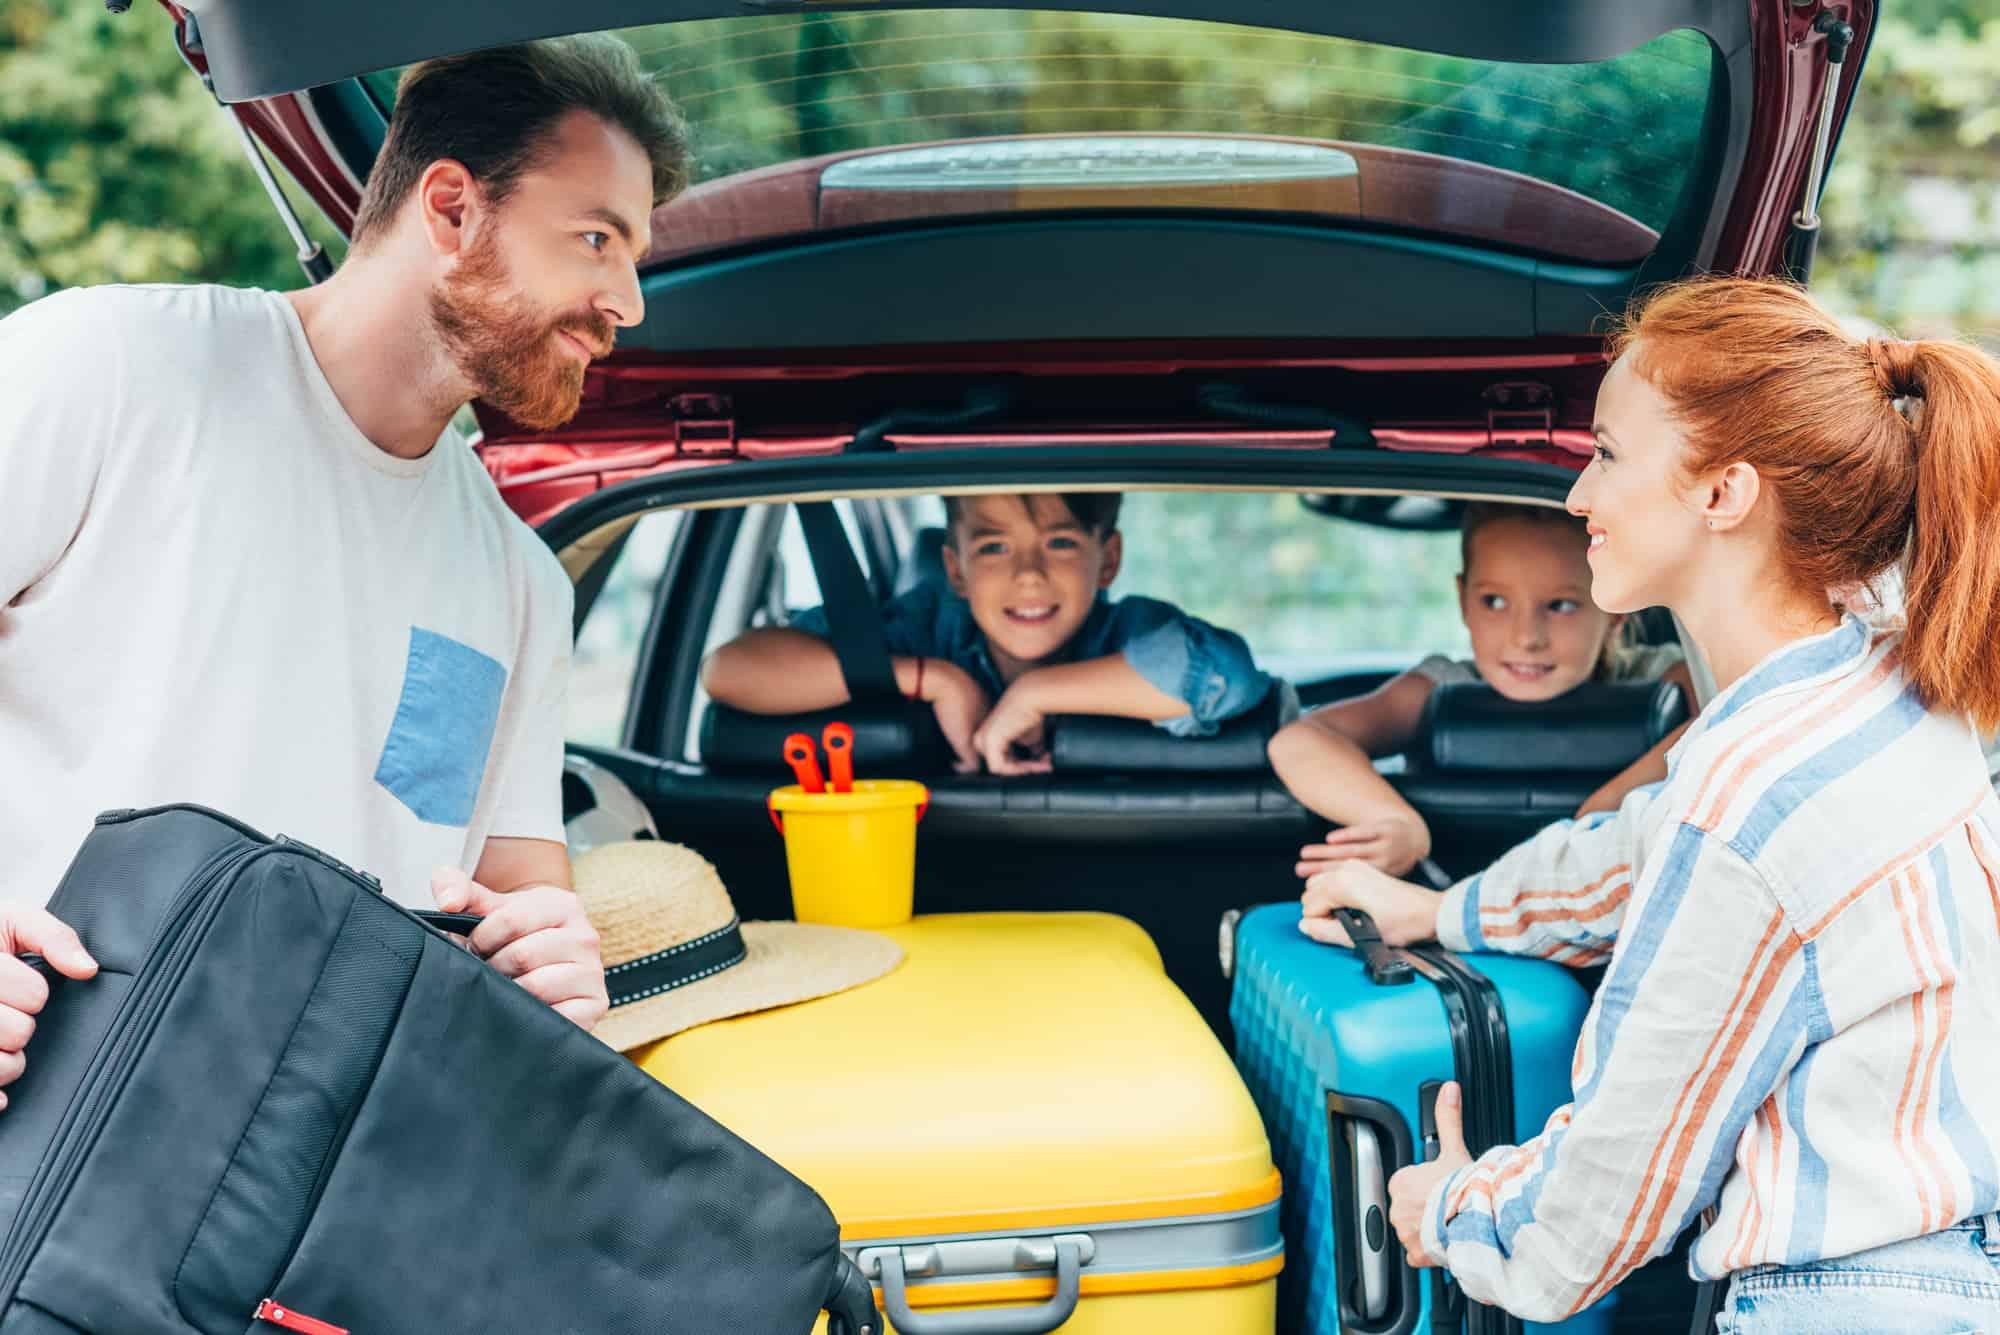 familie med to børn er ved at pakke bilen med kufferter på vej på bilferie ferie